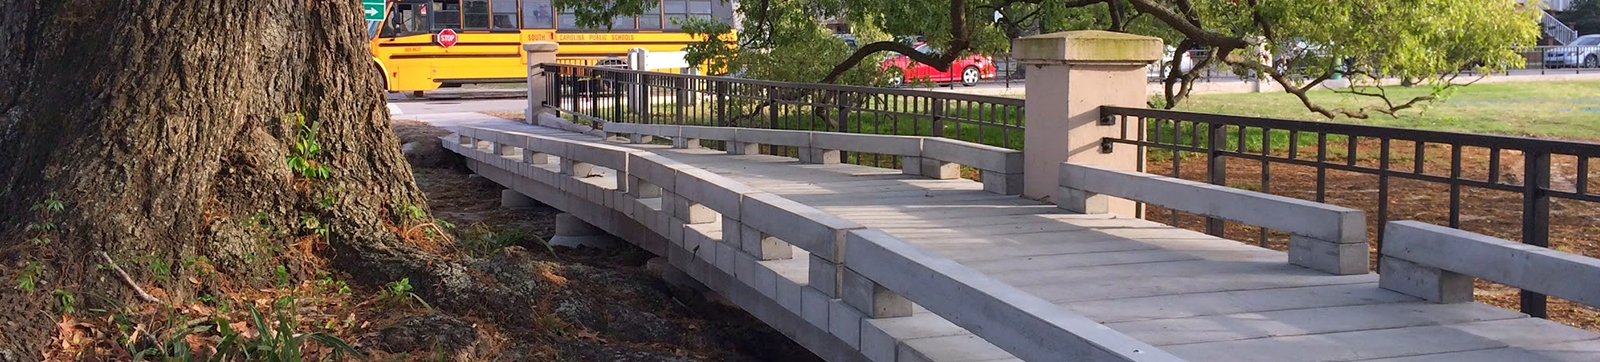 PermaTrak concrete boardwalk section.jpg